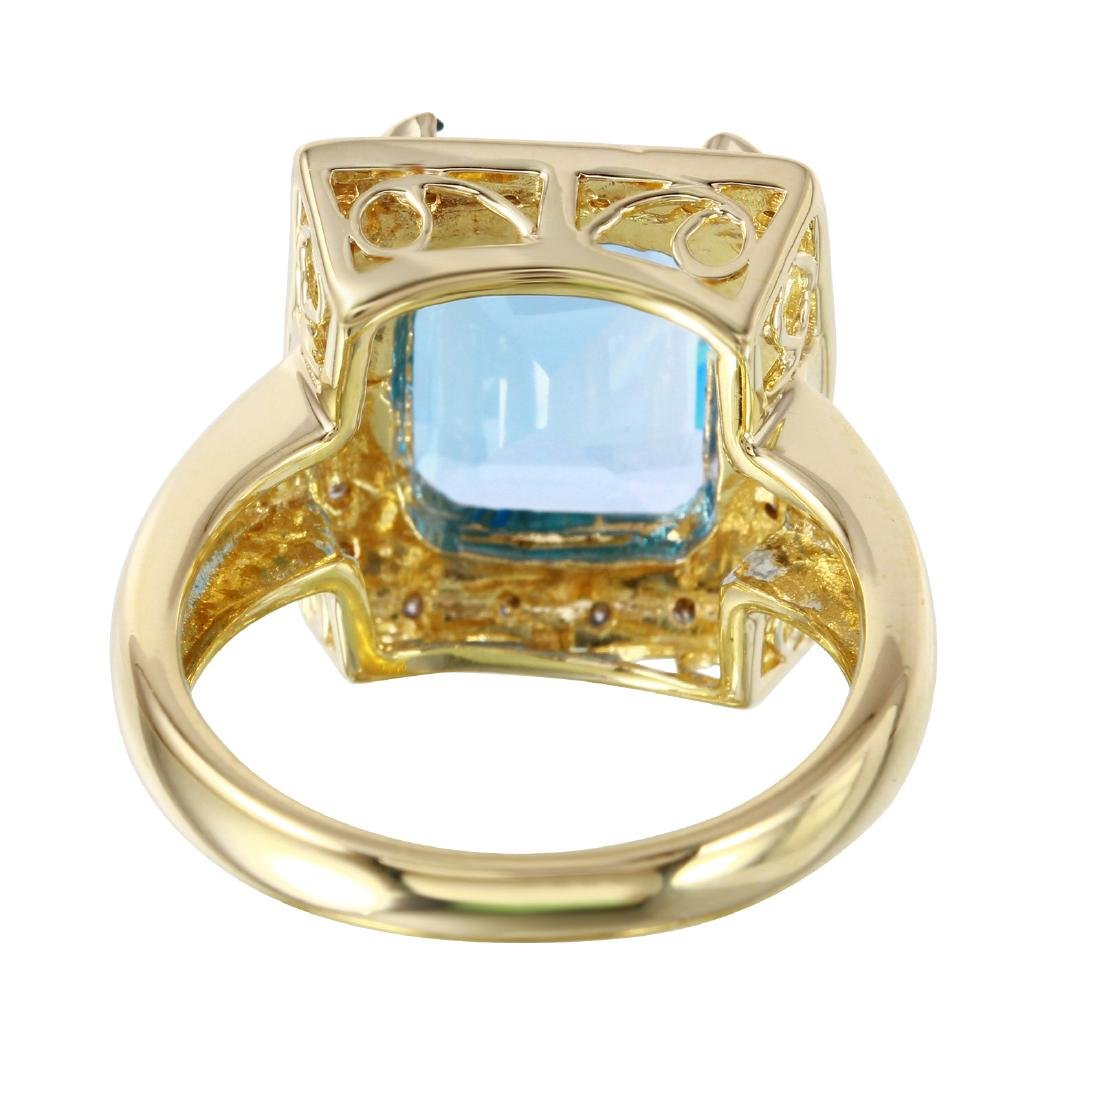 14KT Yellow Gold Topaz & Diamond Ring - 4